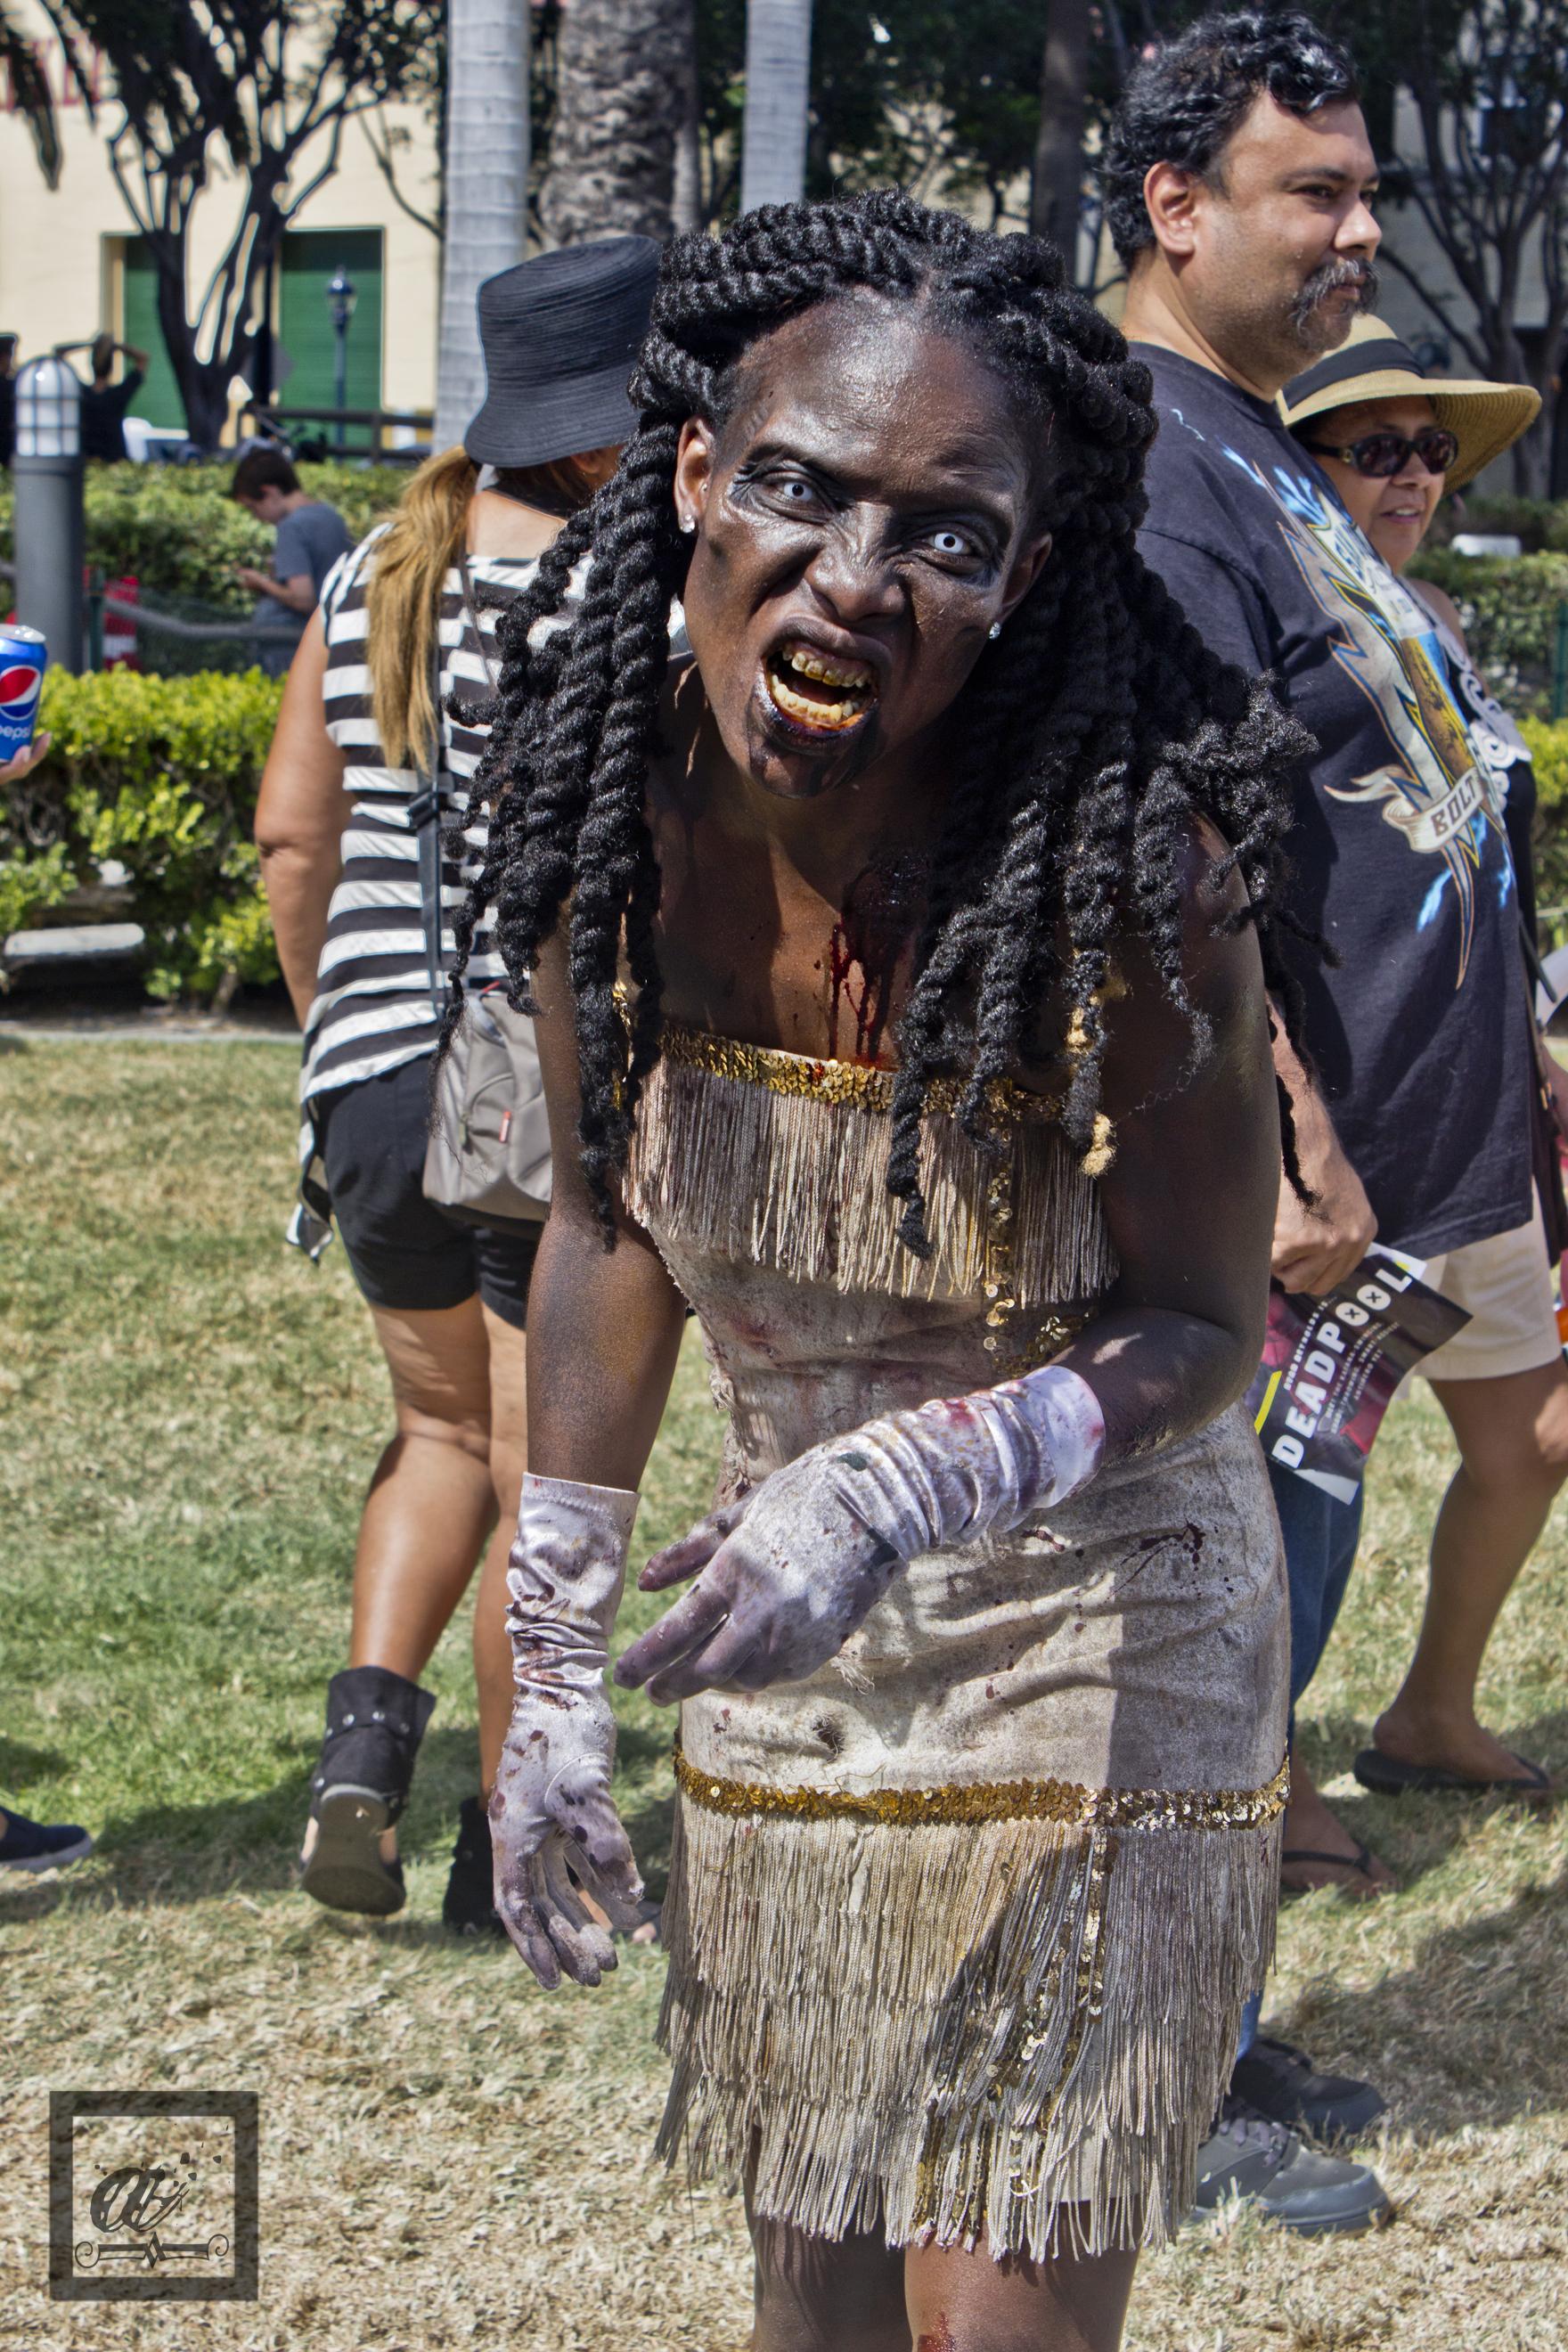 SDCC 2015 Zombie Cosplay